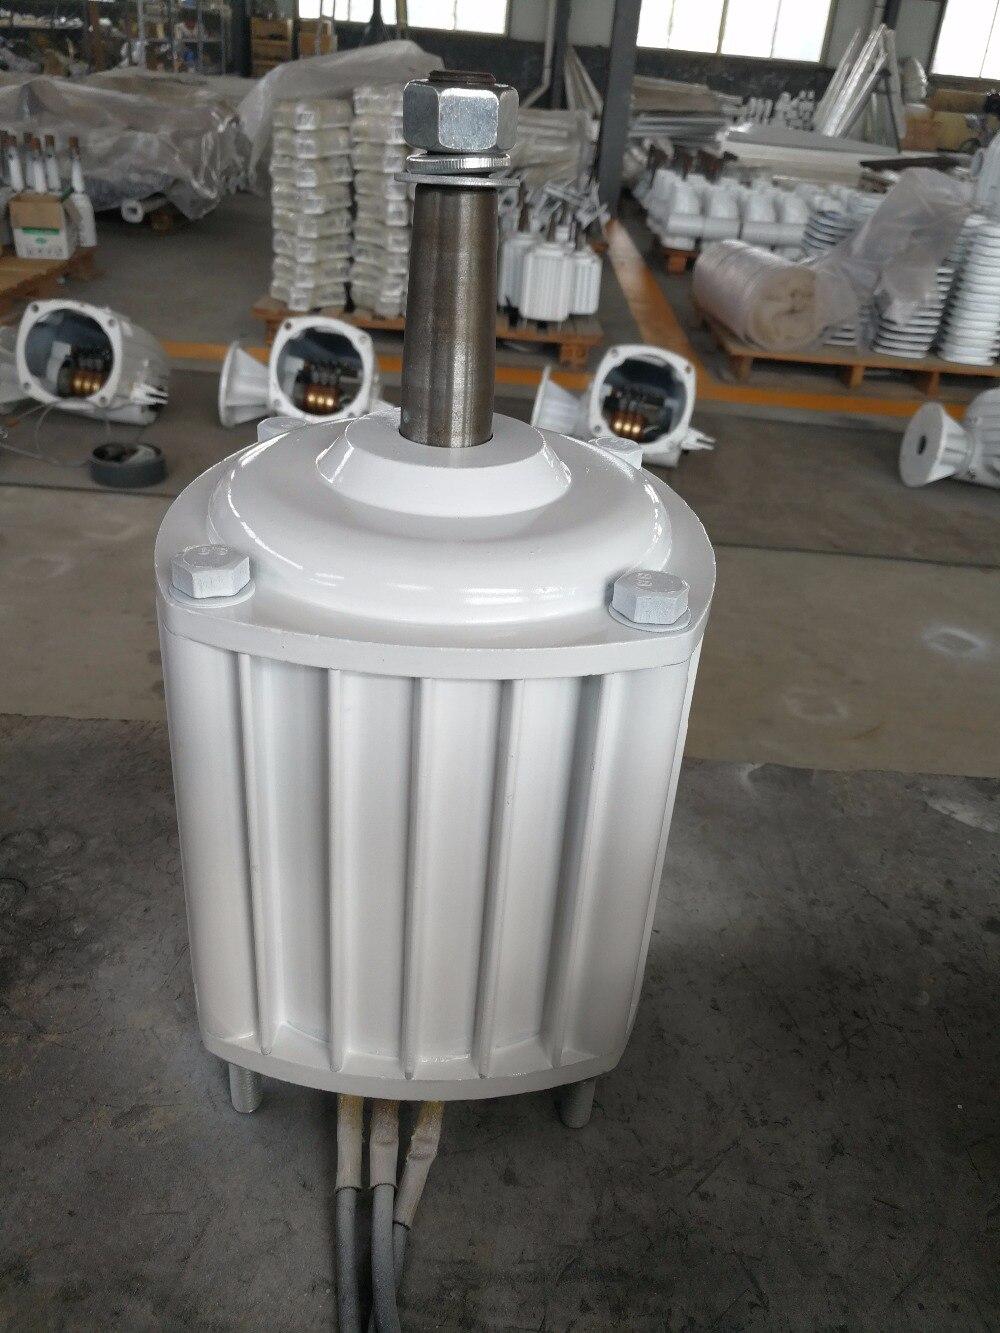 1KW/1000W 400RPM low rpm wind hydro alternator permanent magnet water power dynamotor hydro turbine with grid tie inverter